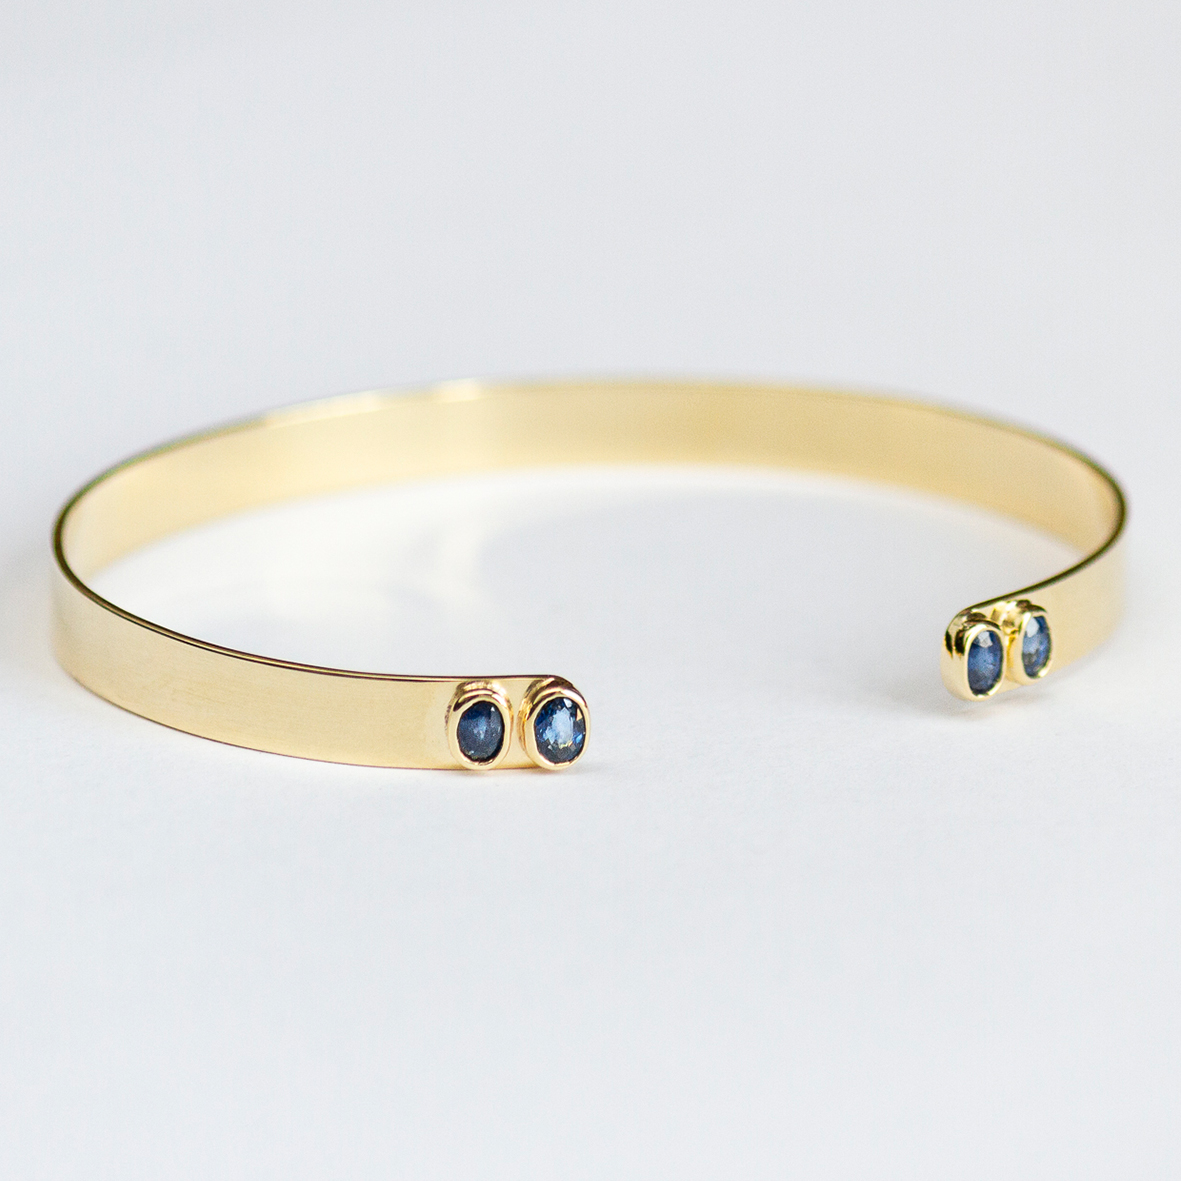 1. OONA_lotus_principal_blue sapphire bracelet